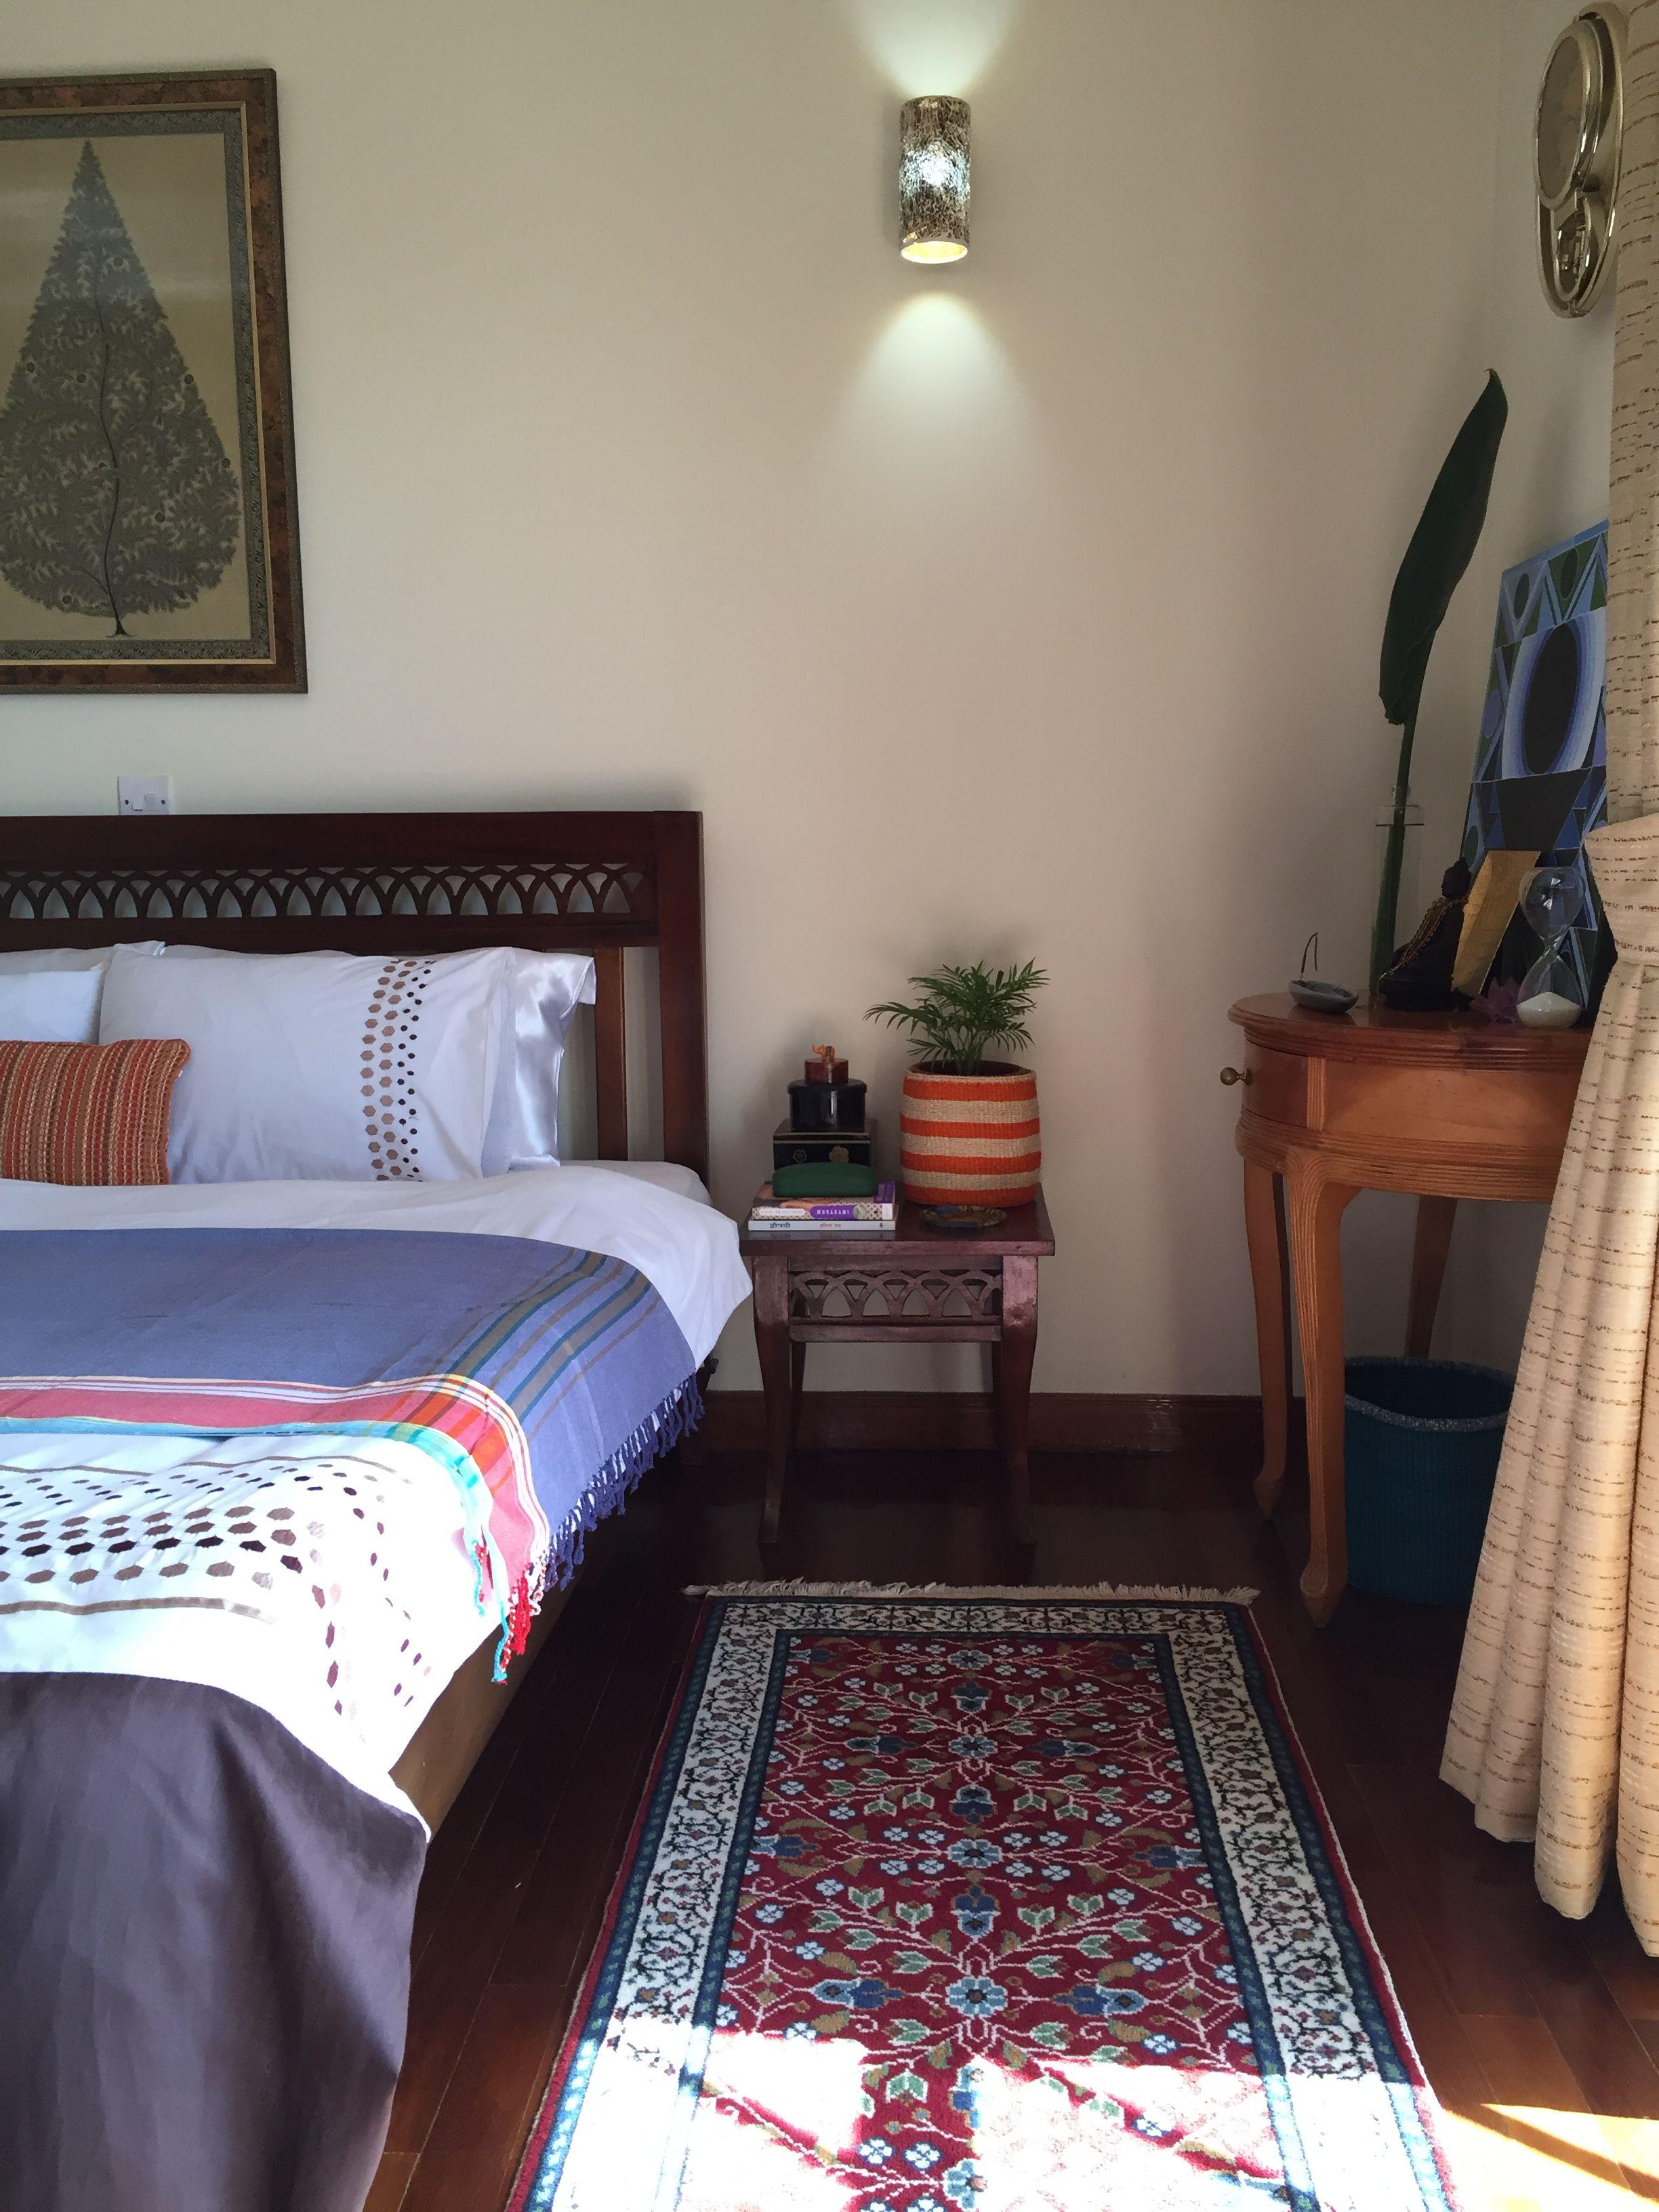 Pin by Sneha Madevan on My Home_villamarigold | Indian ...